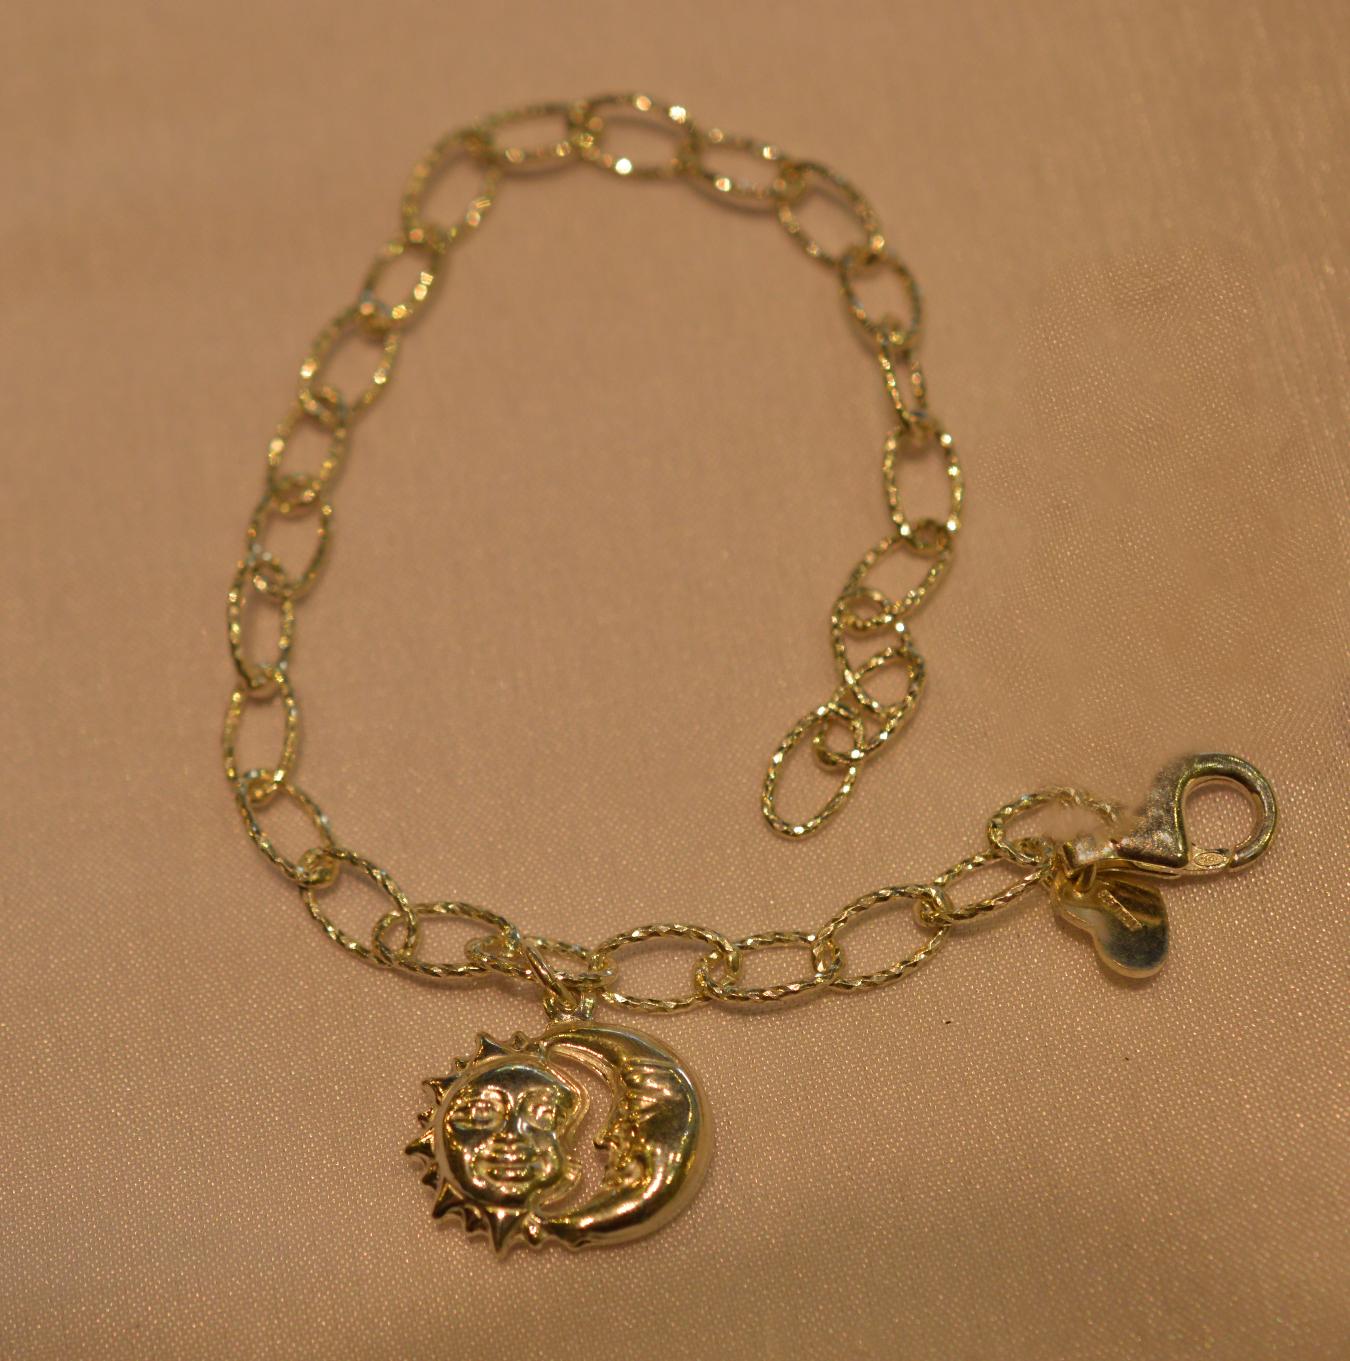 e1cb0d84e58f Pulsera con eslabón torneado y diamantado